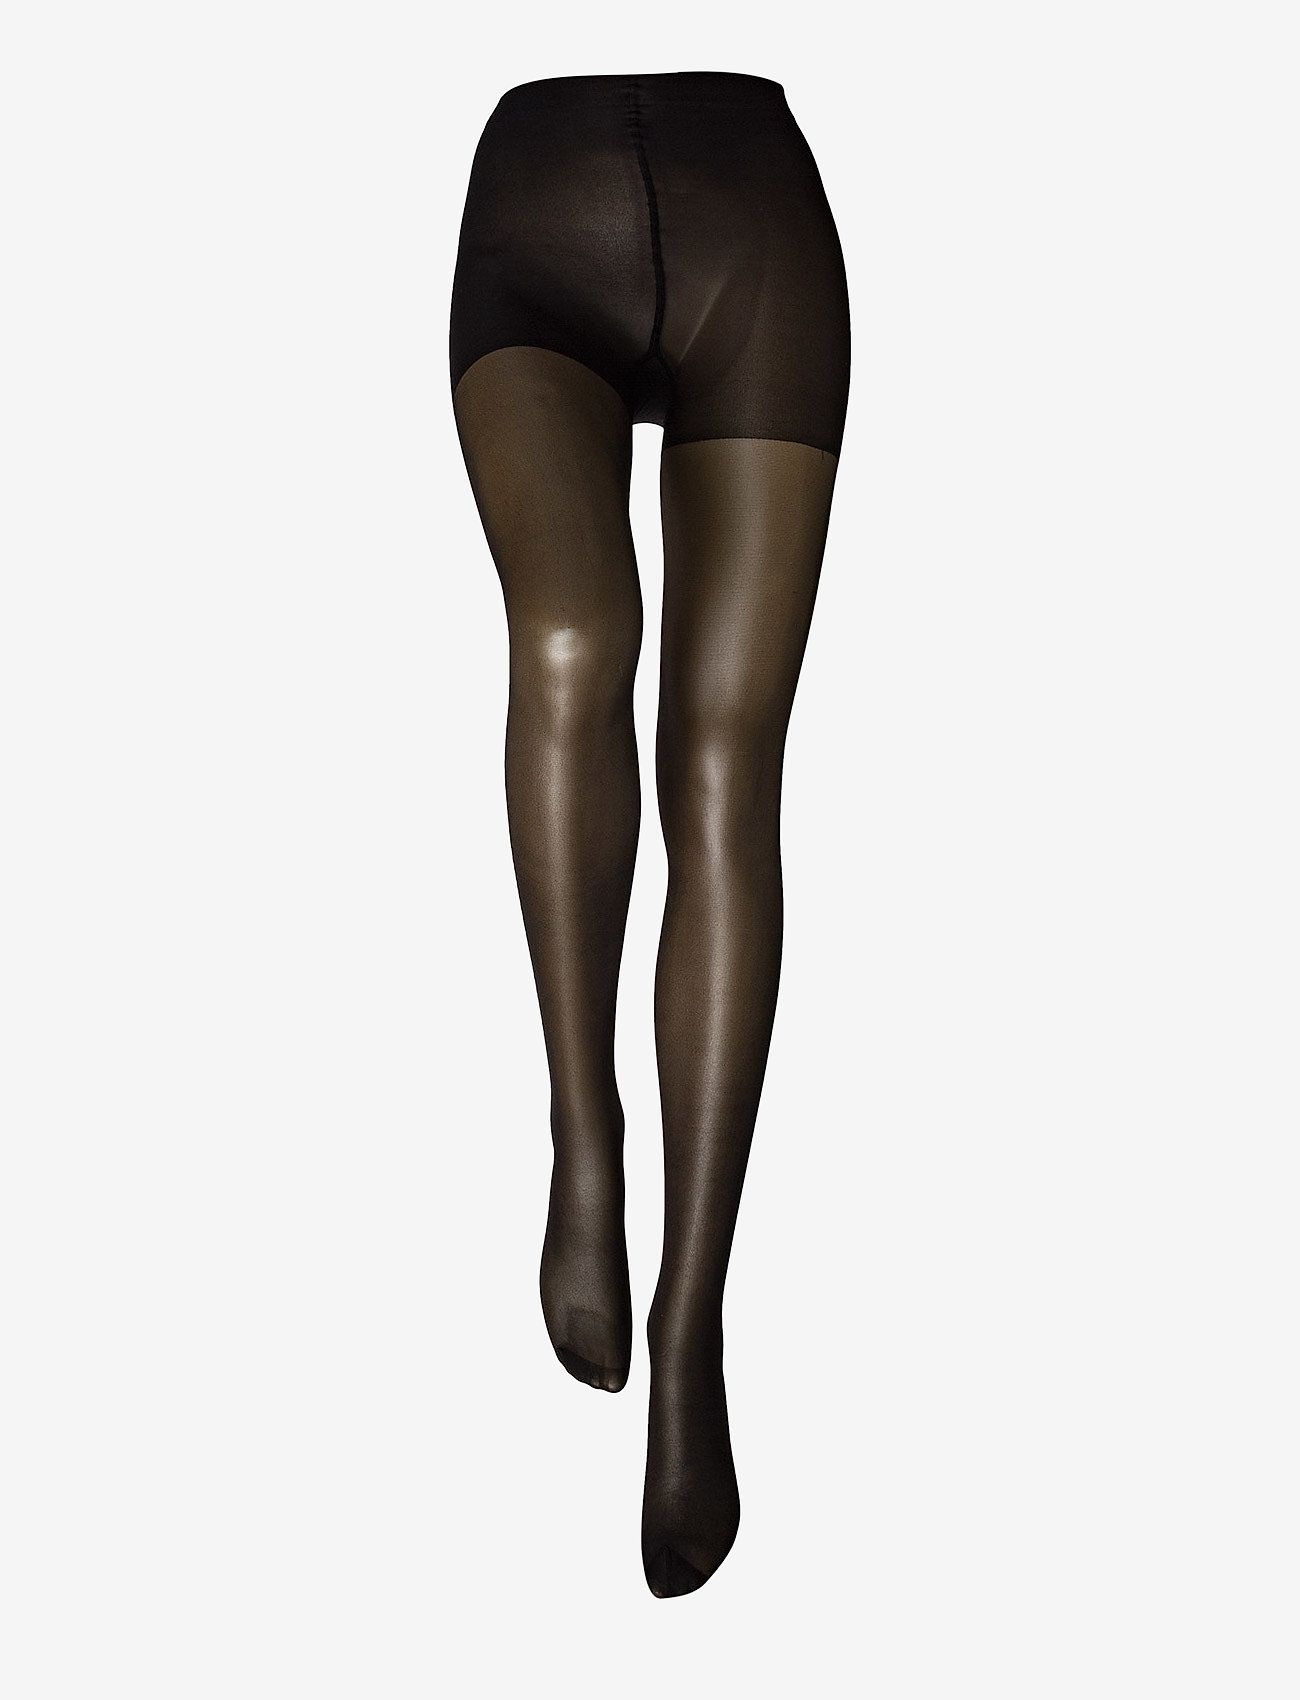 Vogue - Ladies den pantyhose, Slim Magic 20den - basic stroempebukser - black - 1